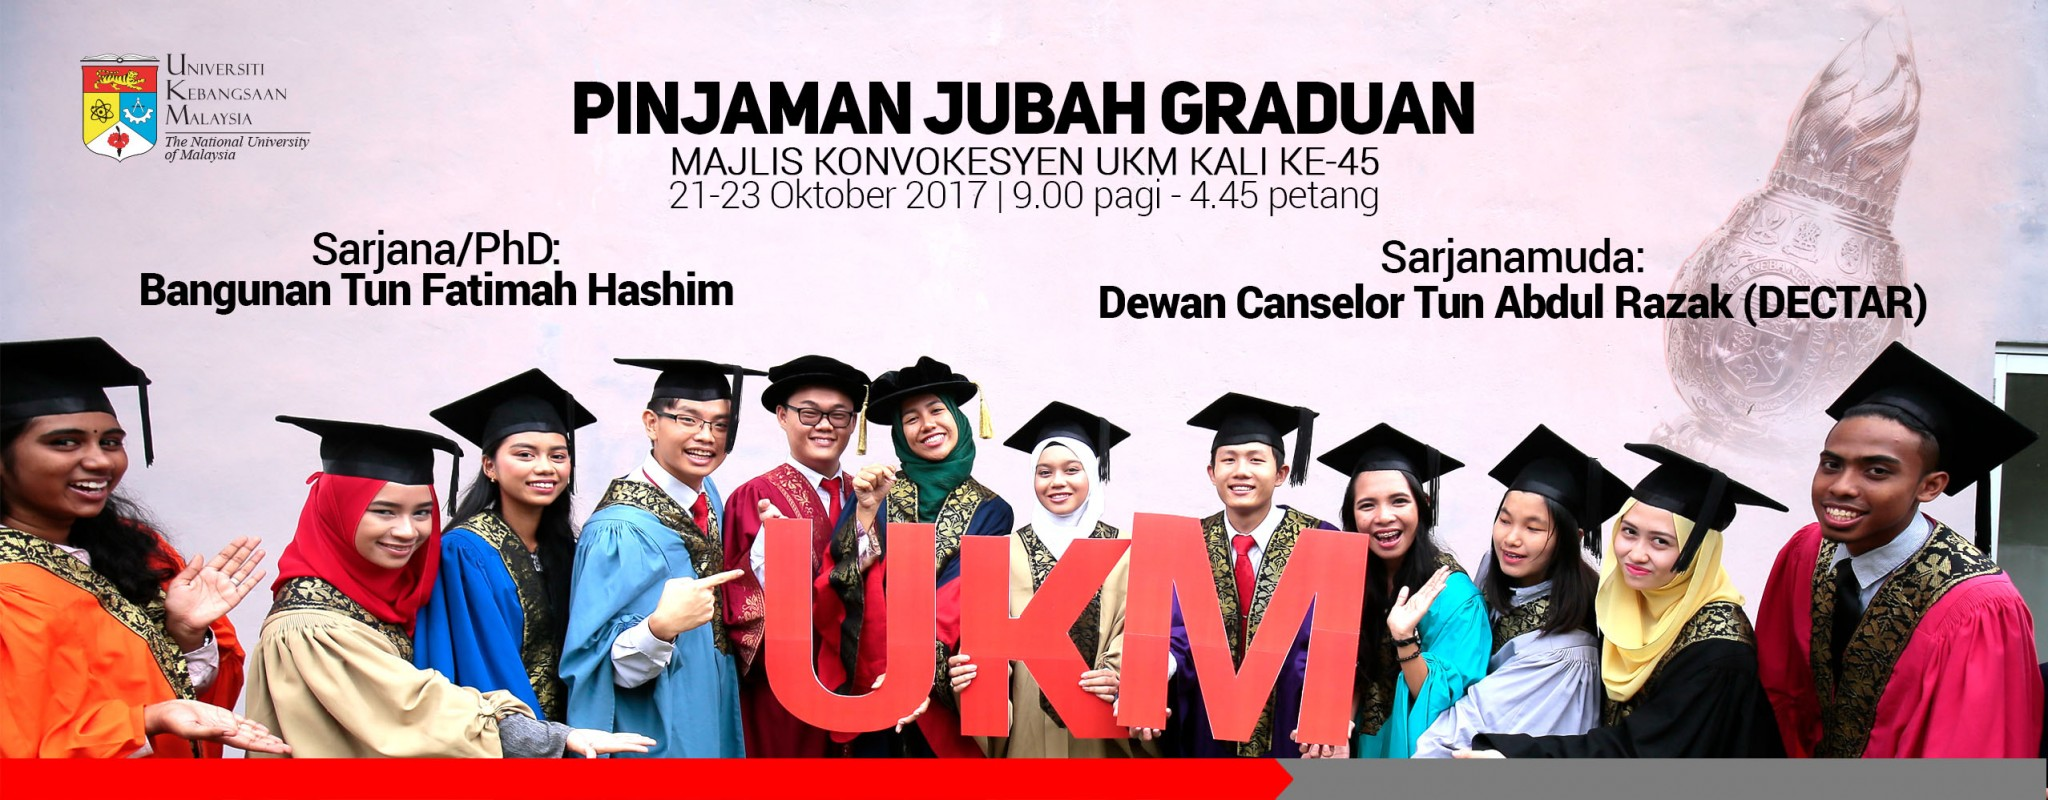 Graduasi 2017-18